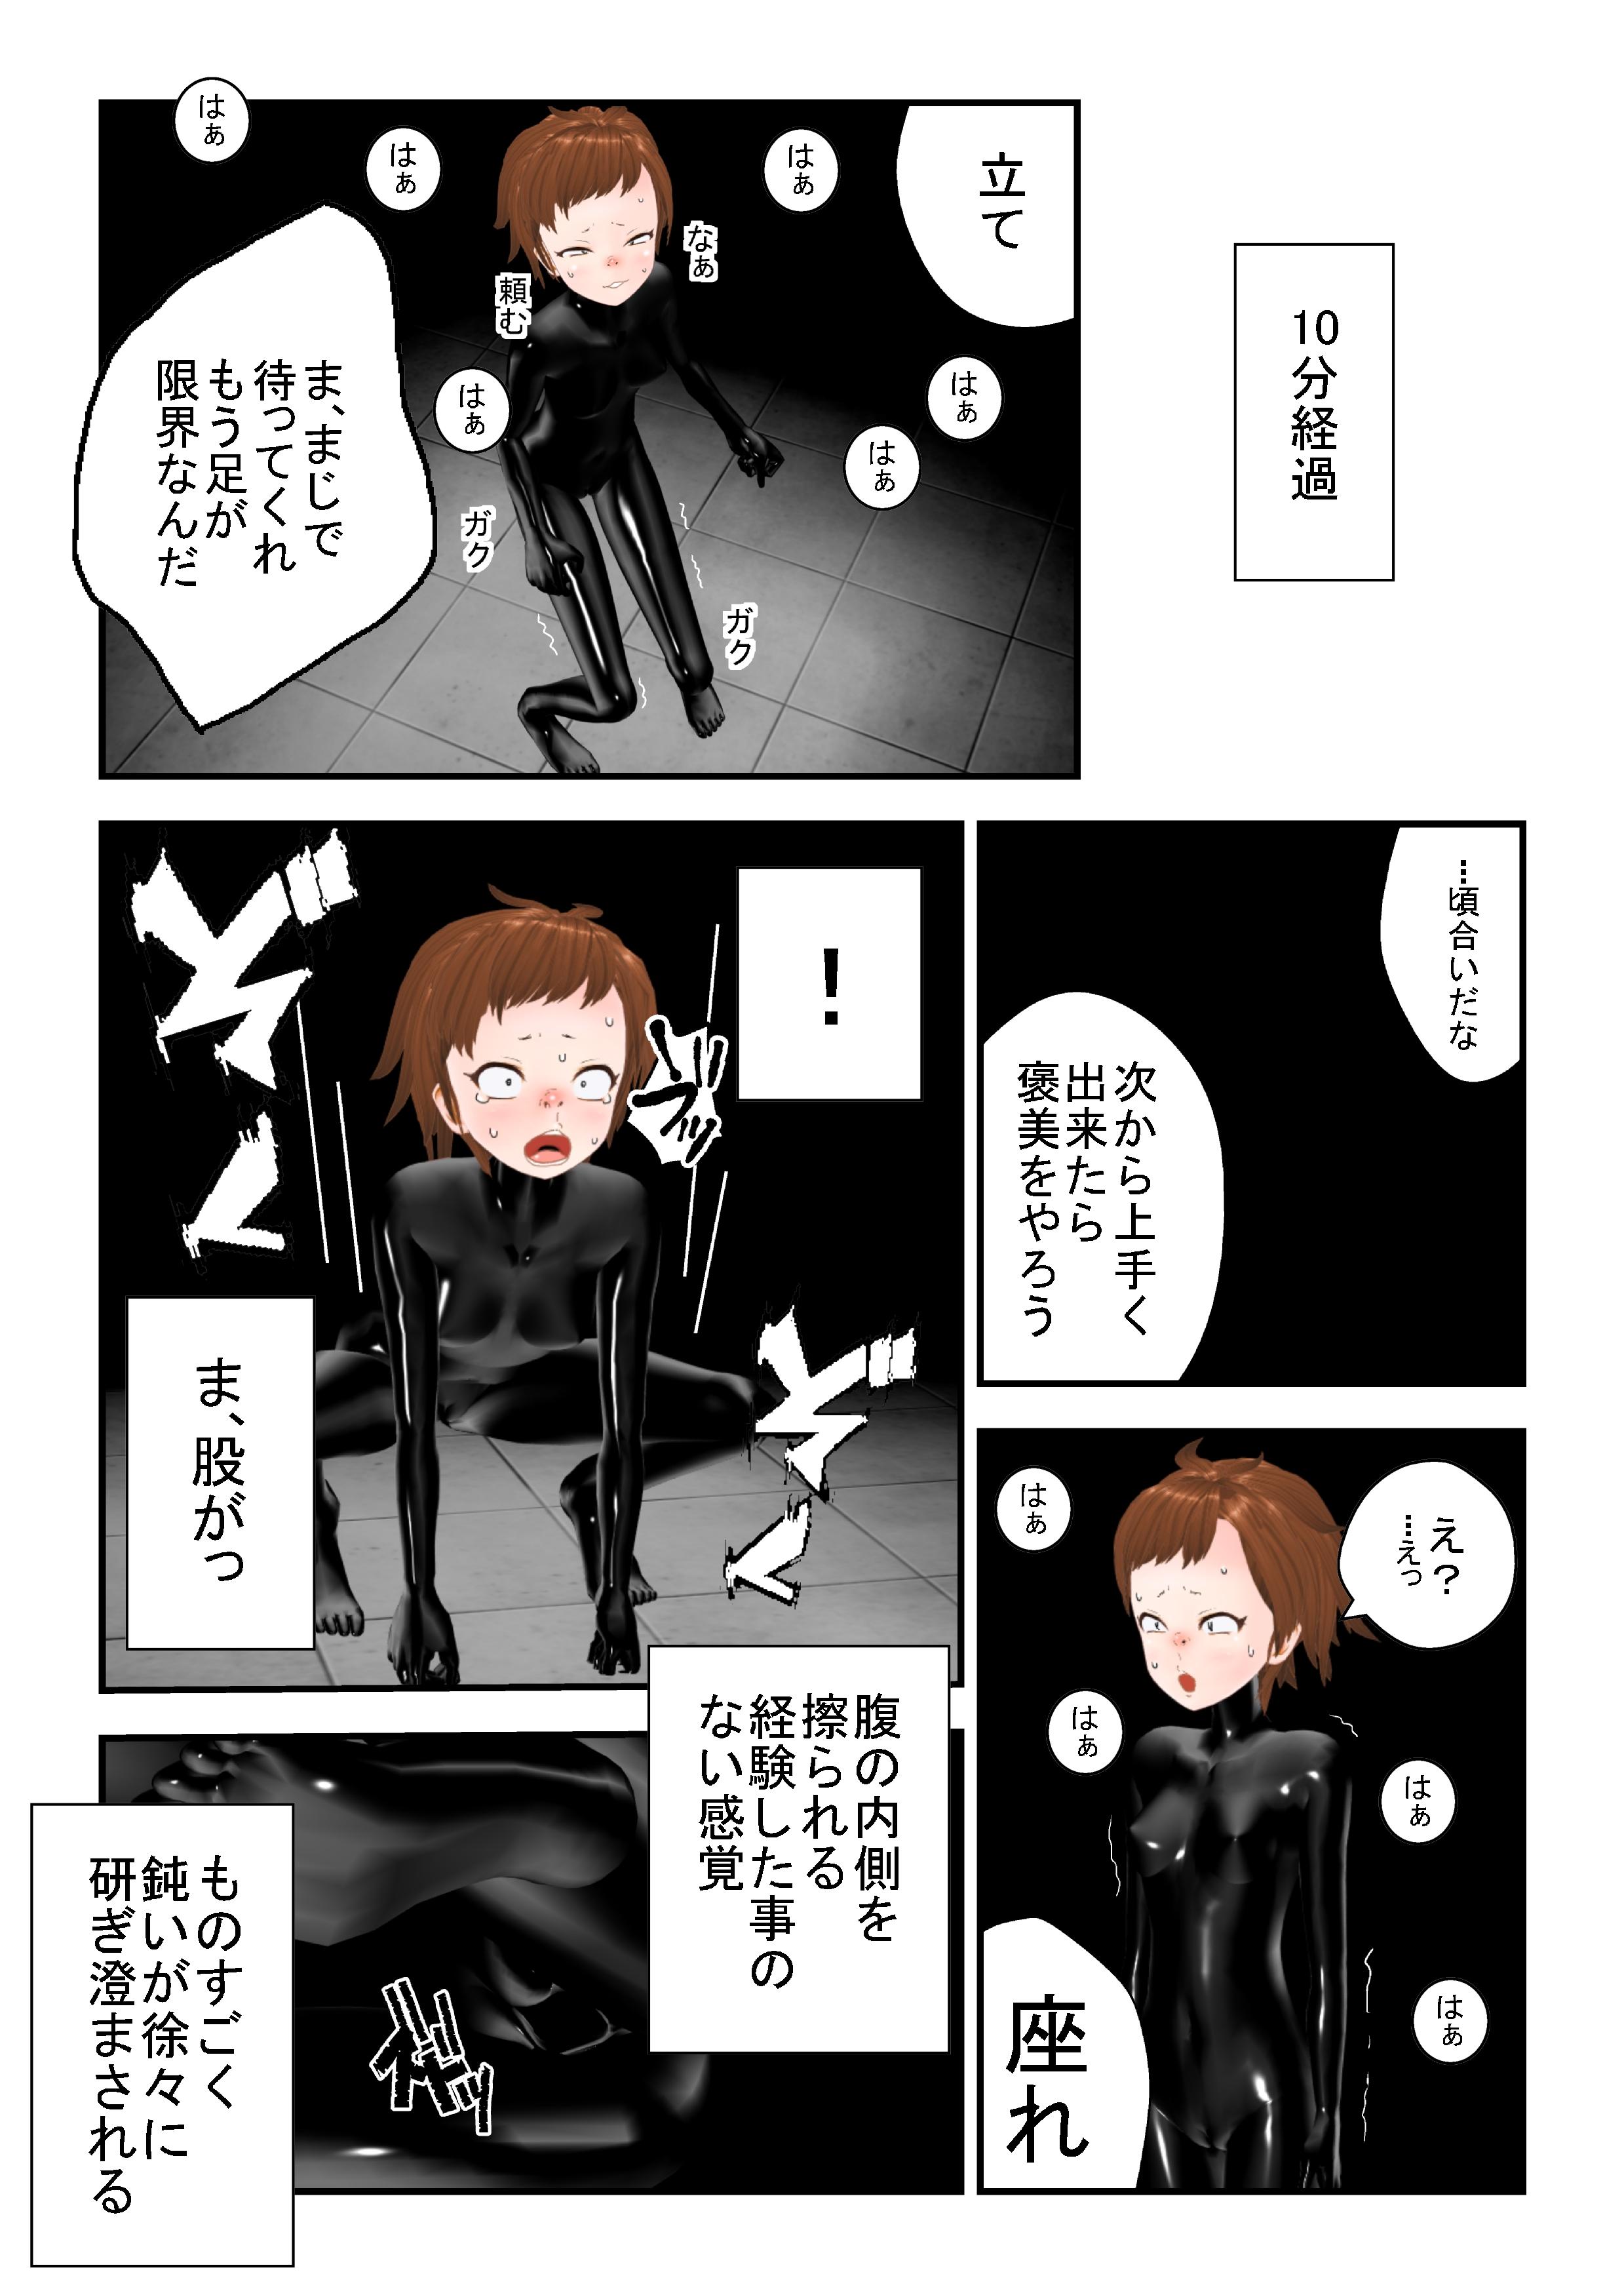 shi_0013_3.jpg